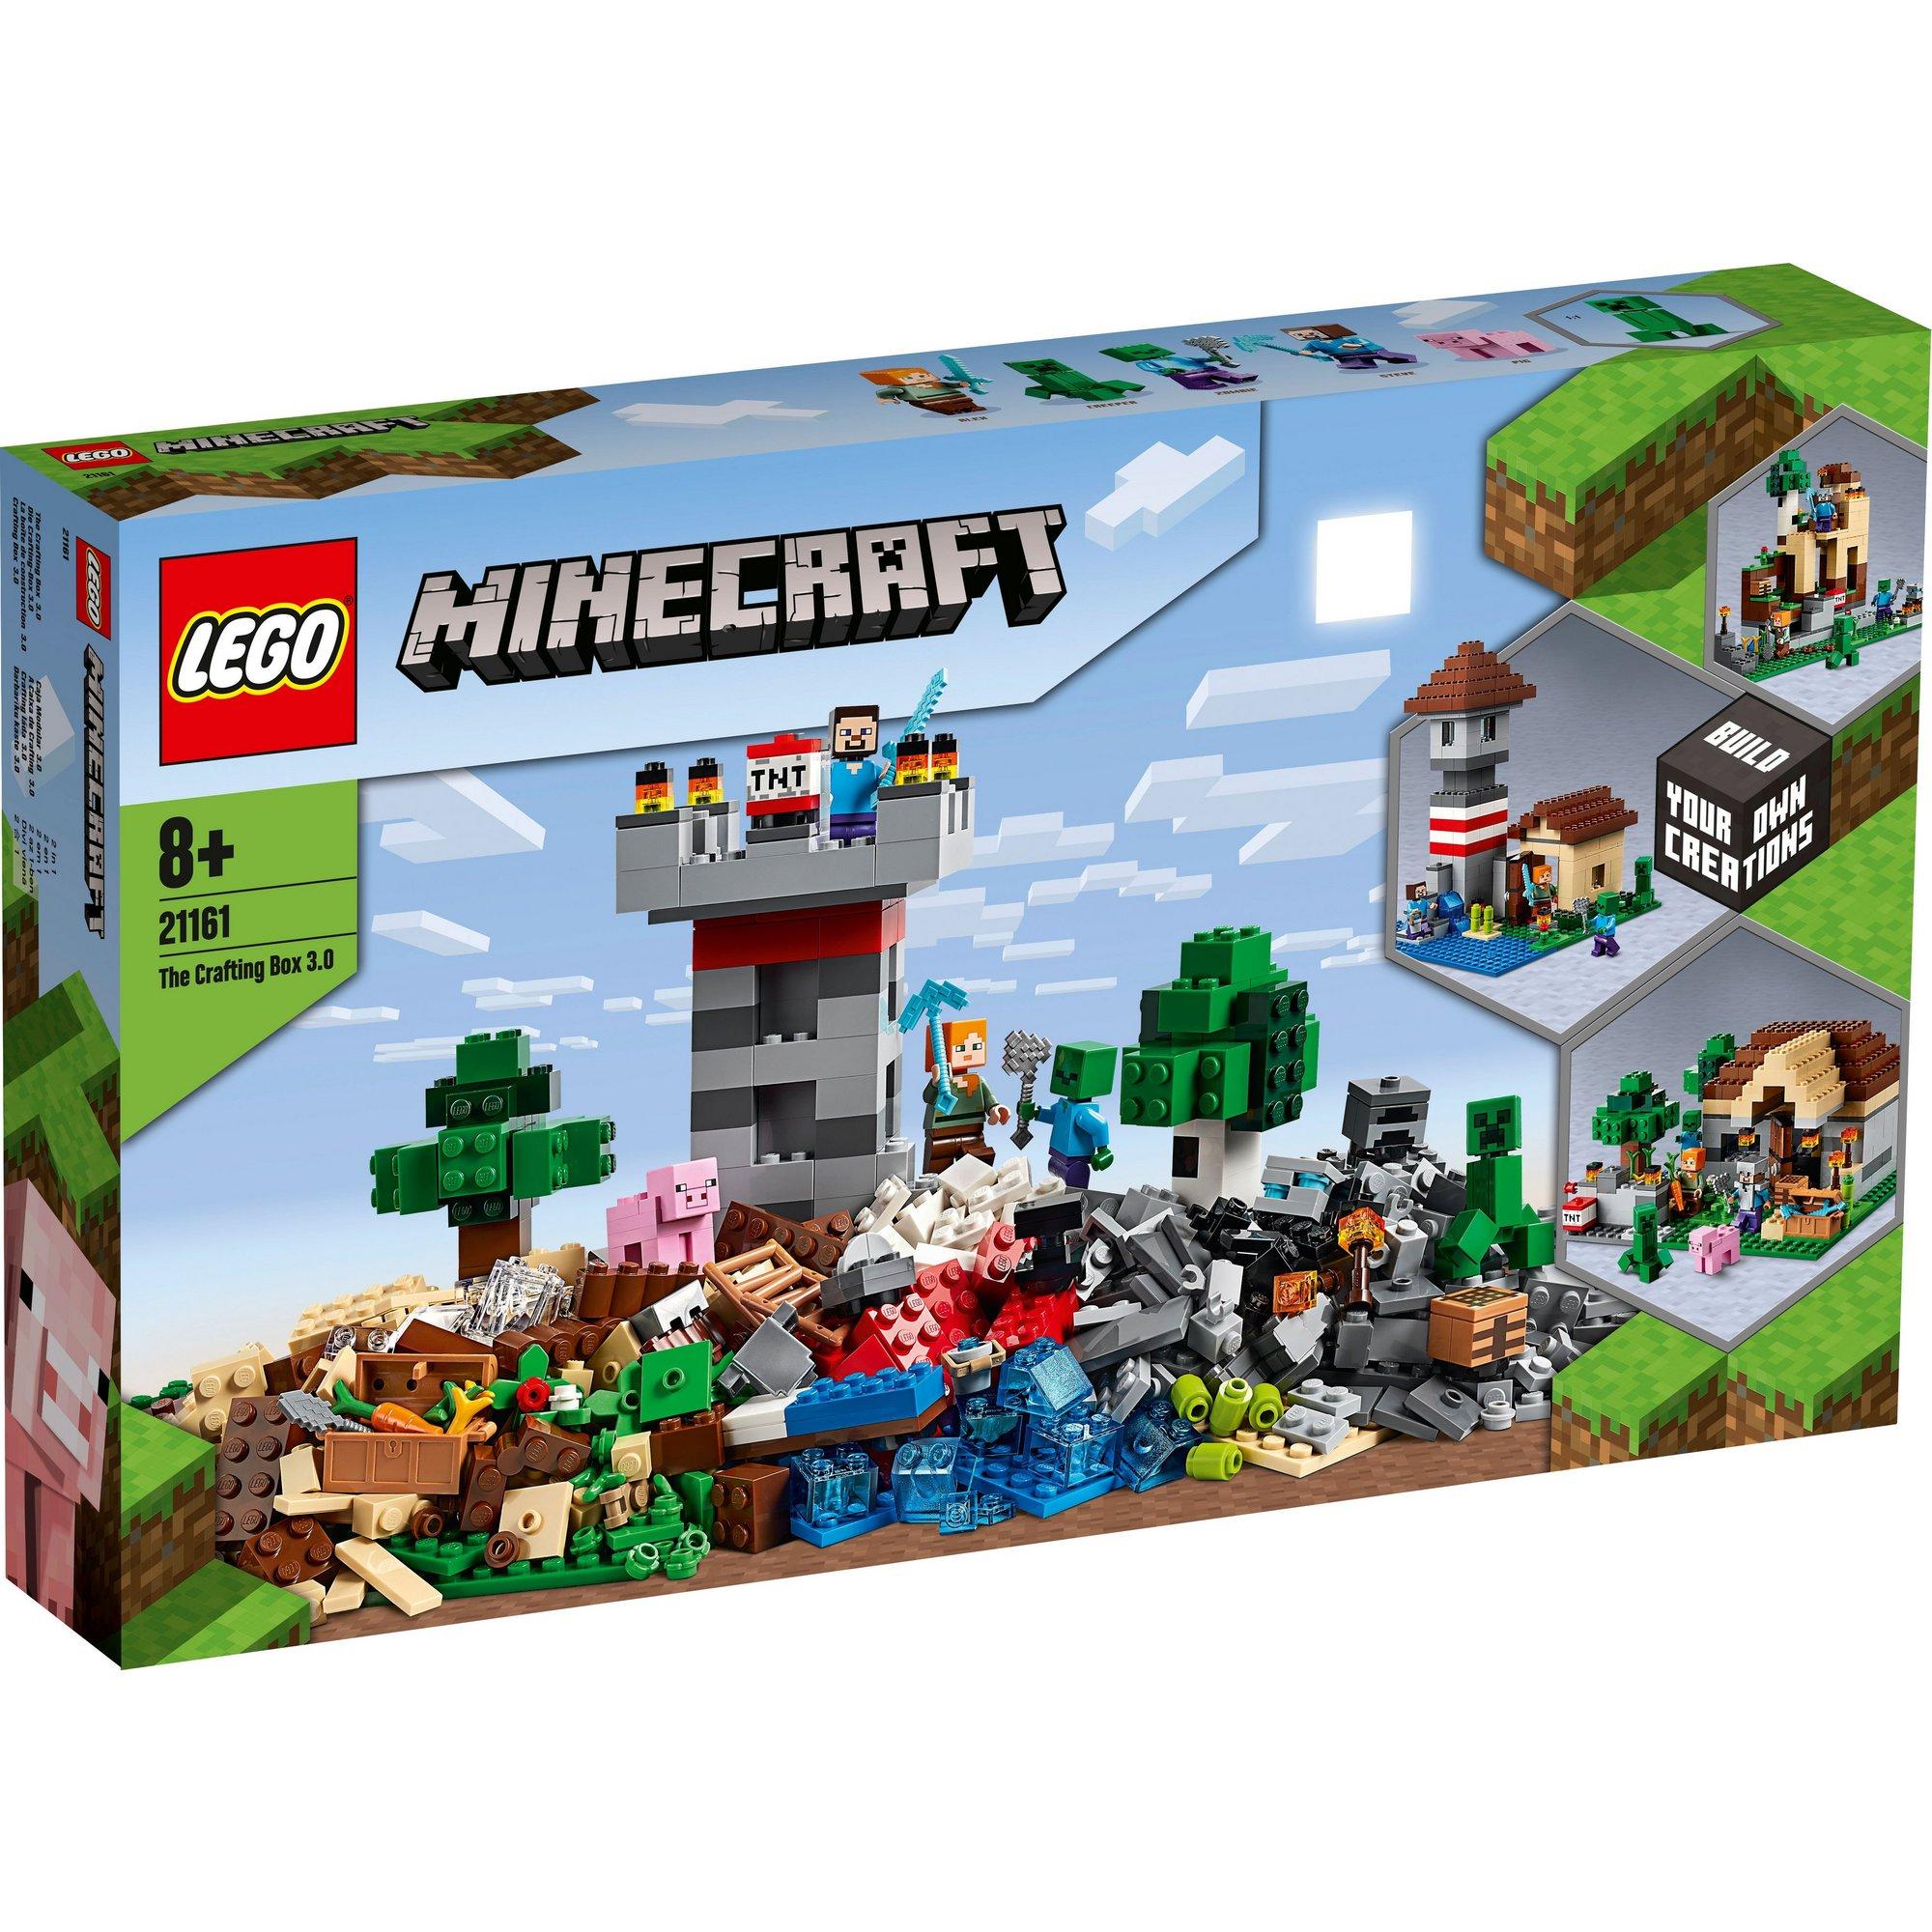 Image of LEGO Minecraft The Crafting Box 3.0